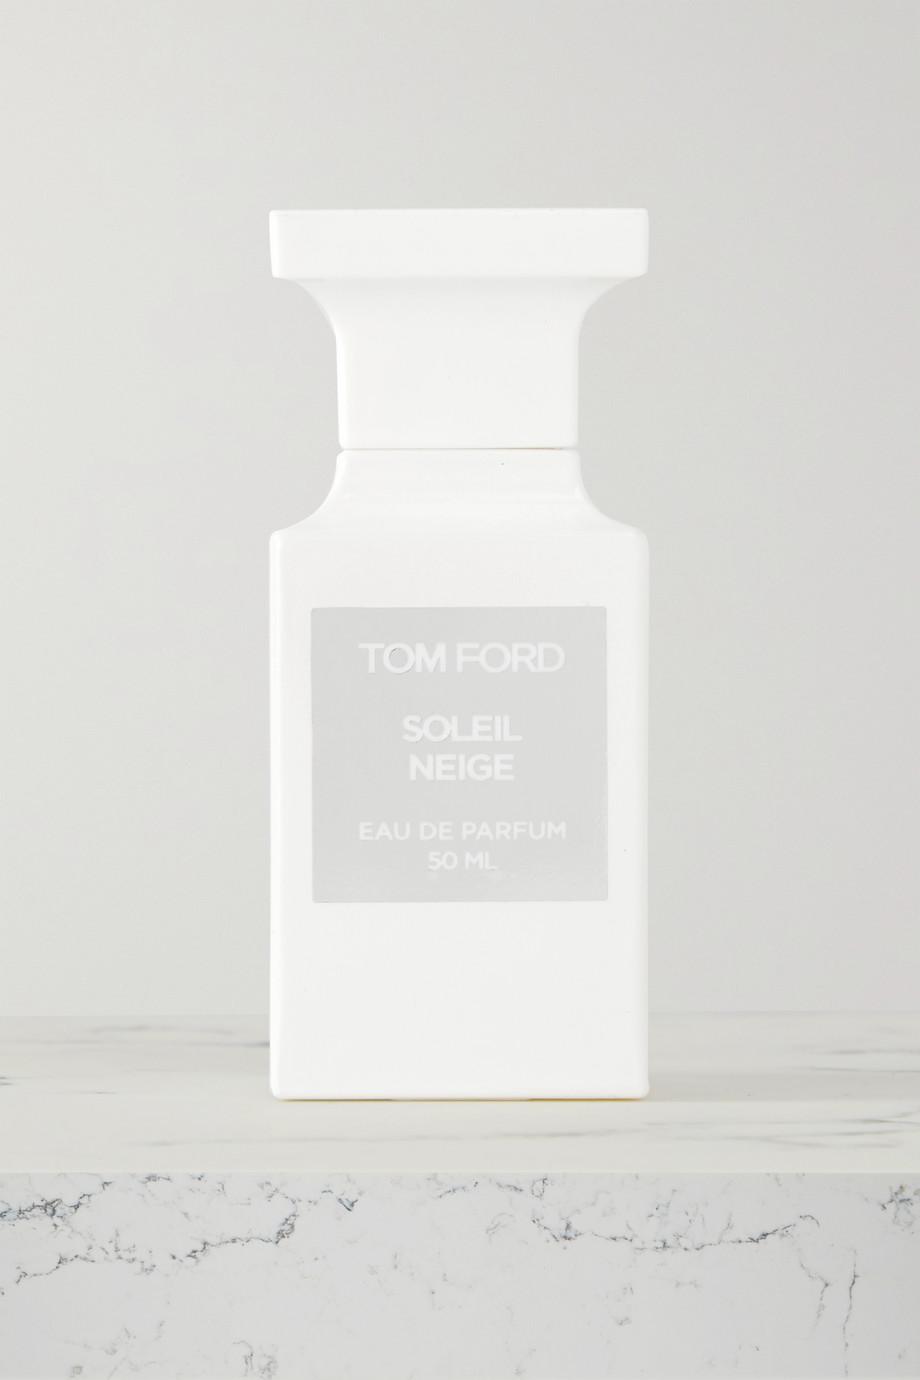 TOM FORD BEAUTY Eau de parfum Soleil Neige, 50 ml